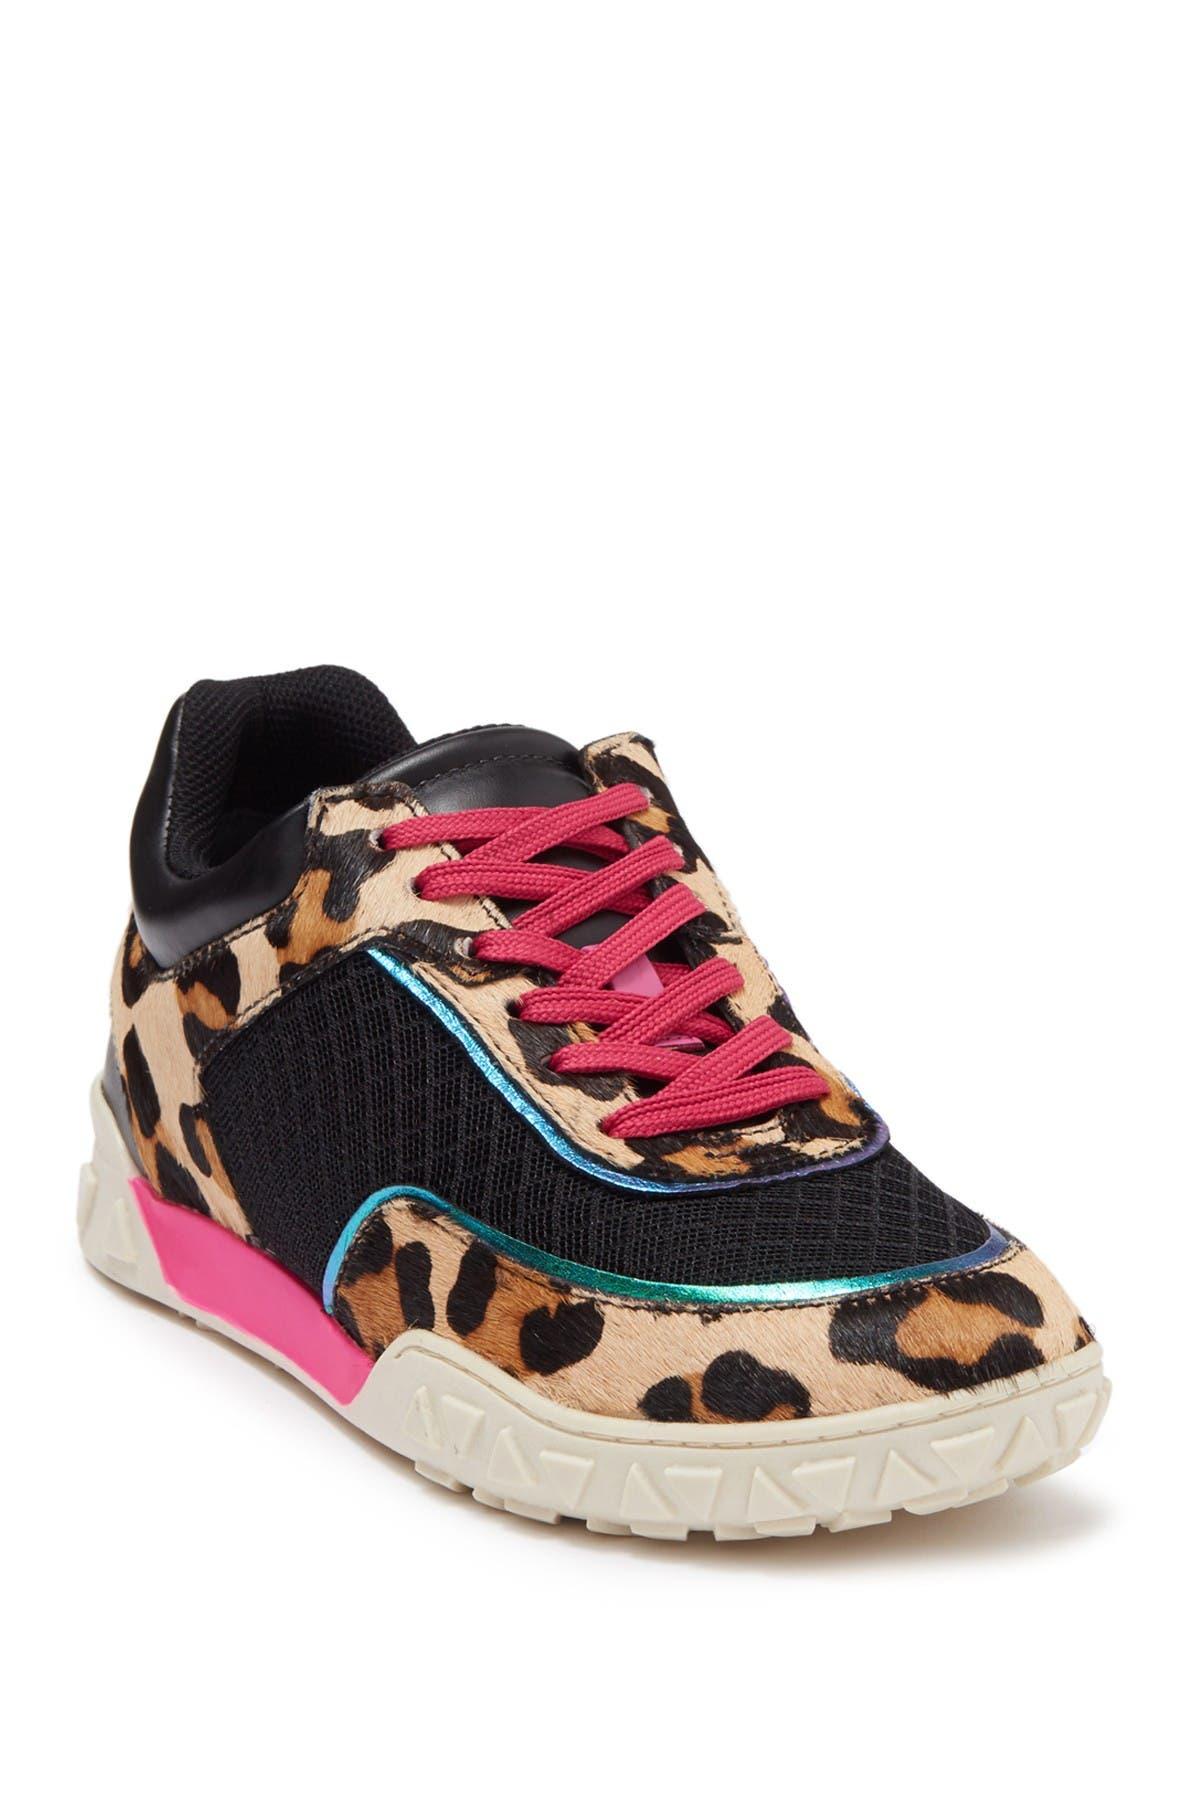 Image of Schutz Naila Leopard Print Sneaker